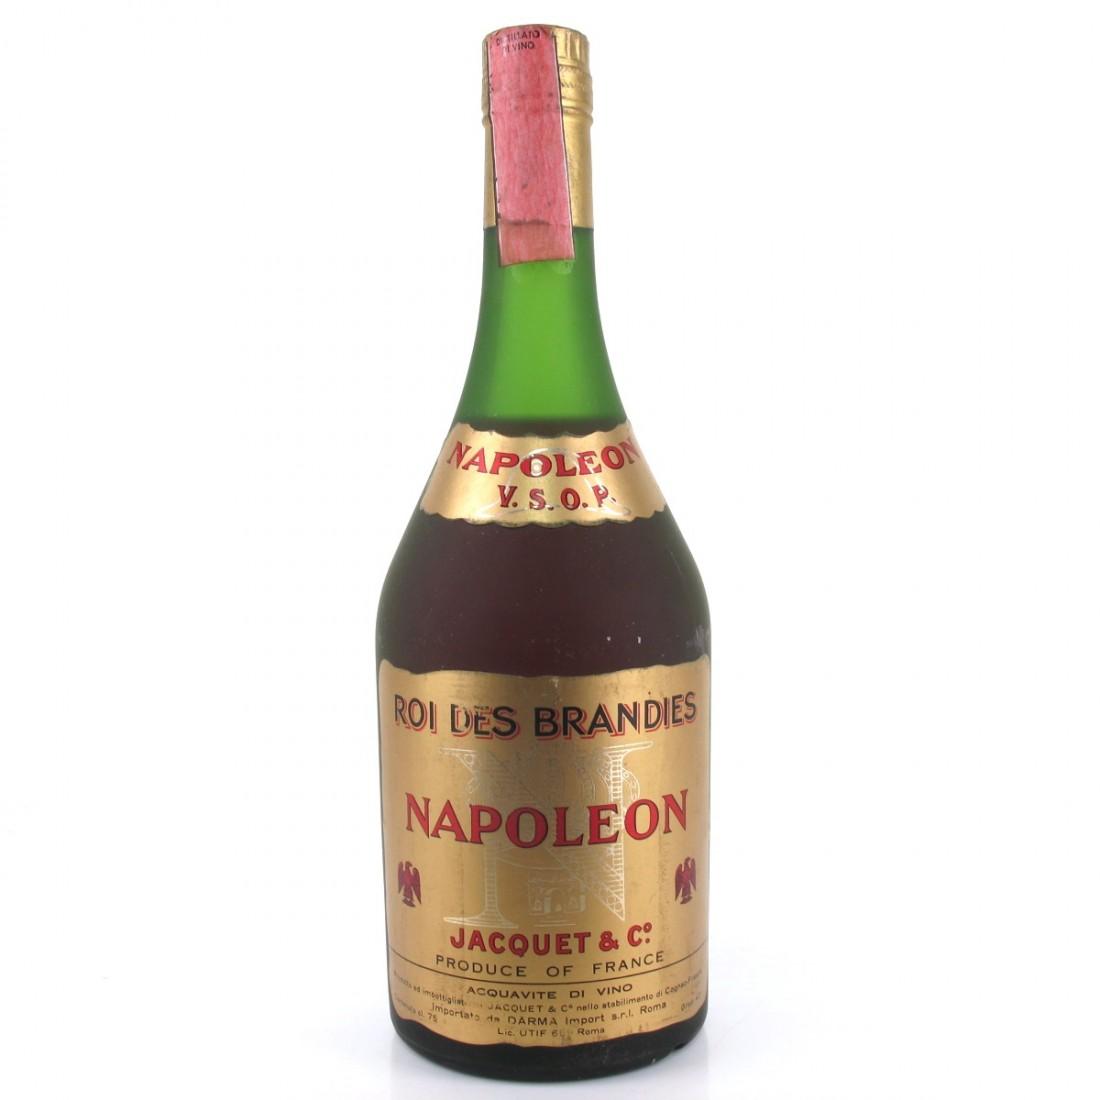 Jacquet and Co. Napoleon VSOP Brandy 1970s